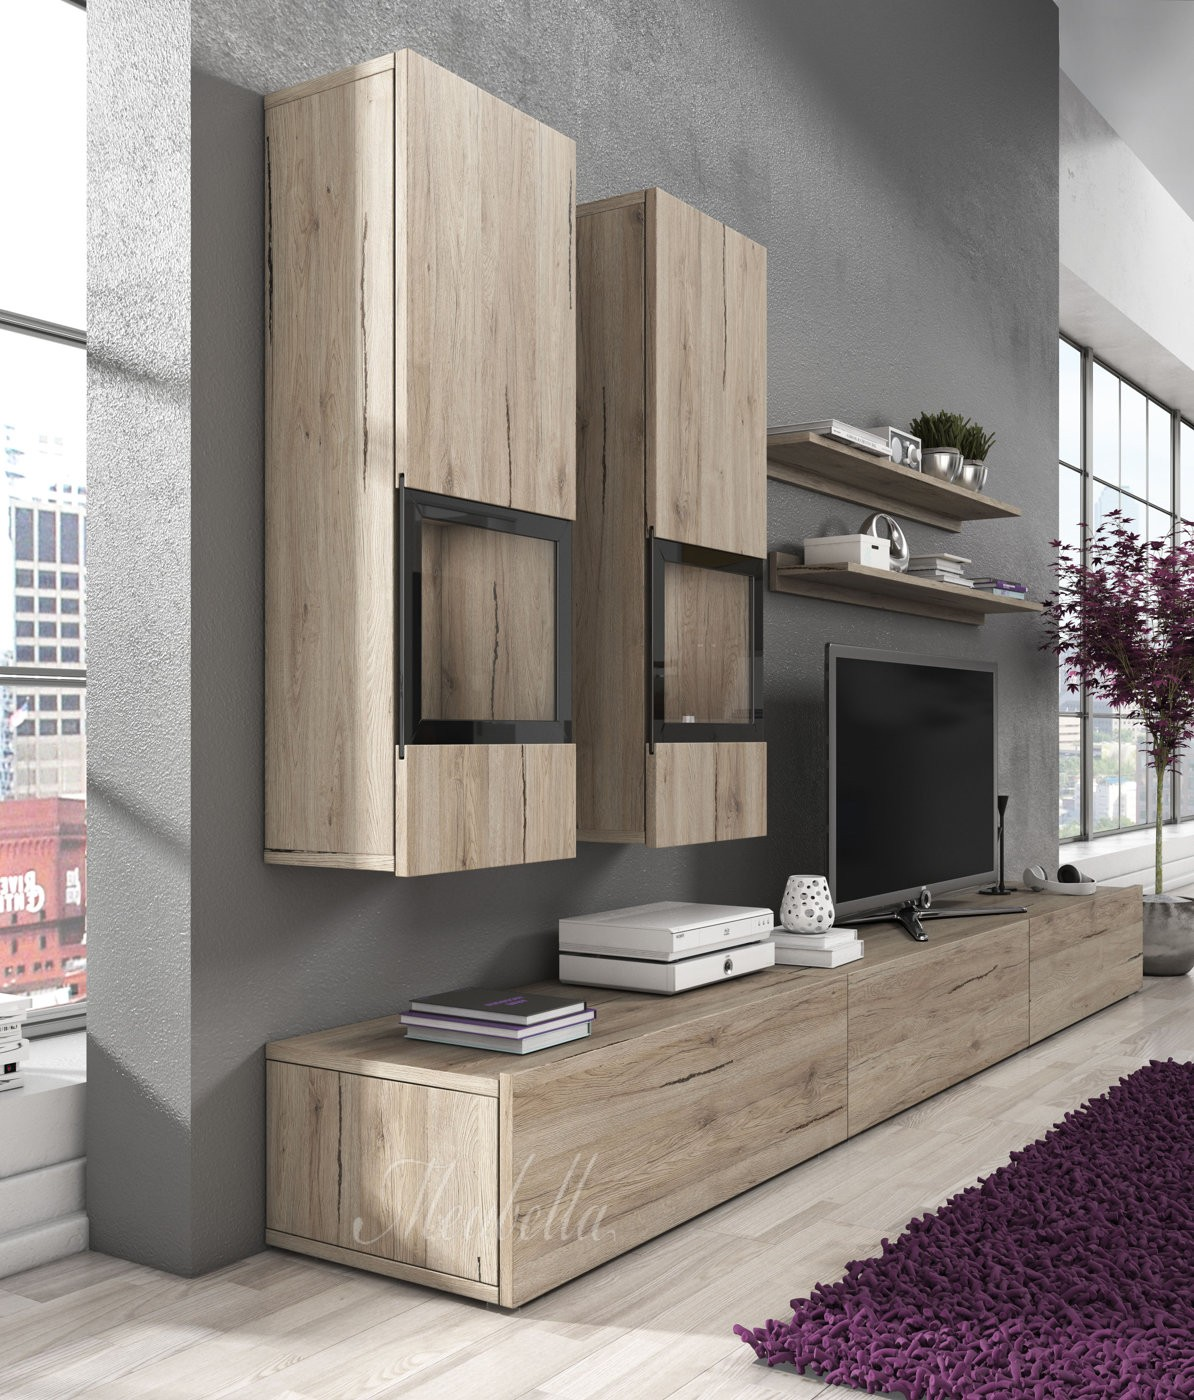 Woonkamer wandmeubels woonkamer wandmeubels beste for Harmsen interieur